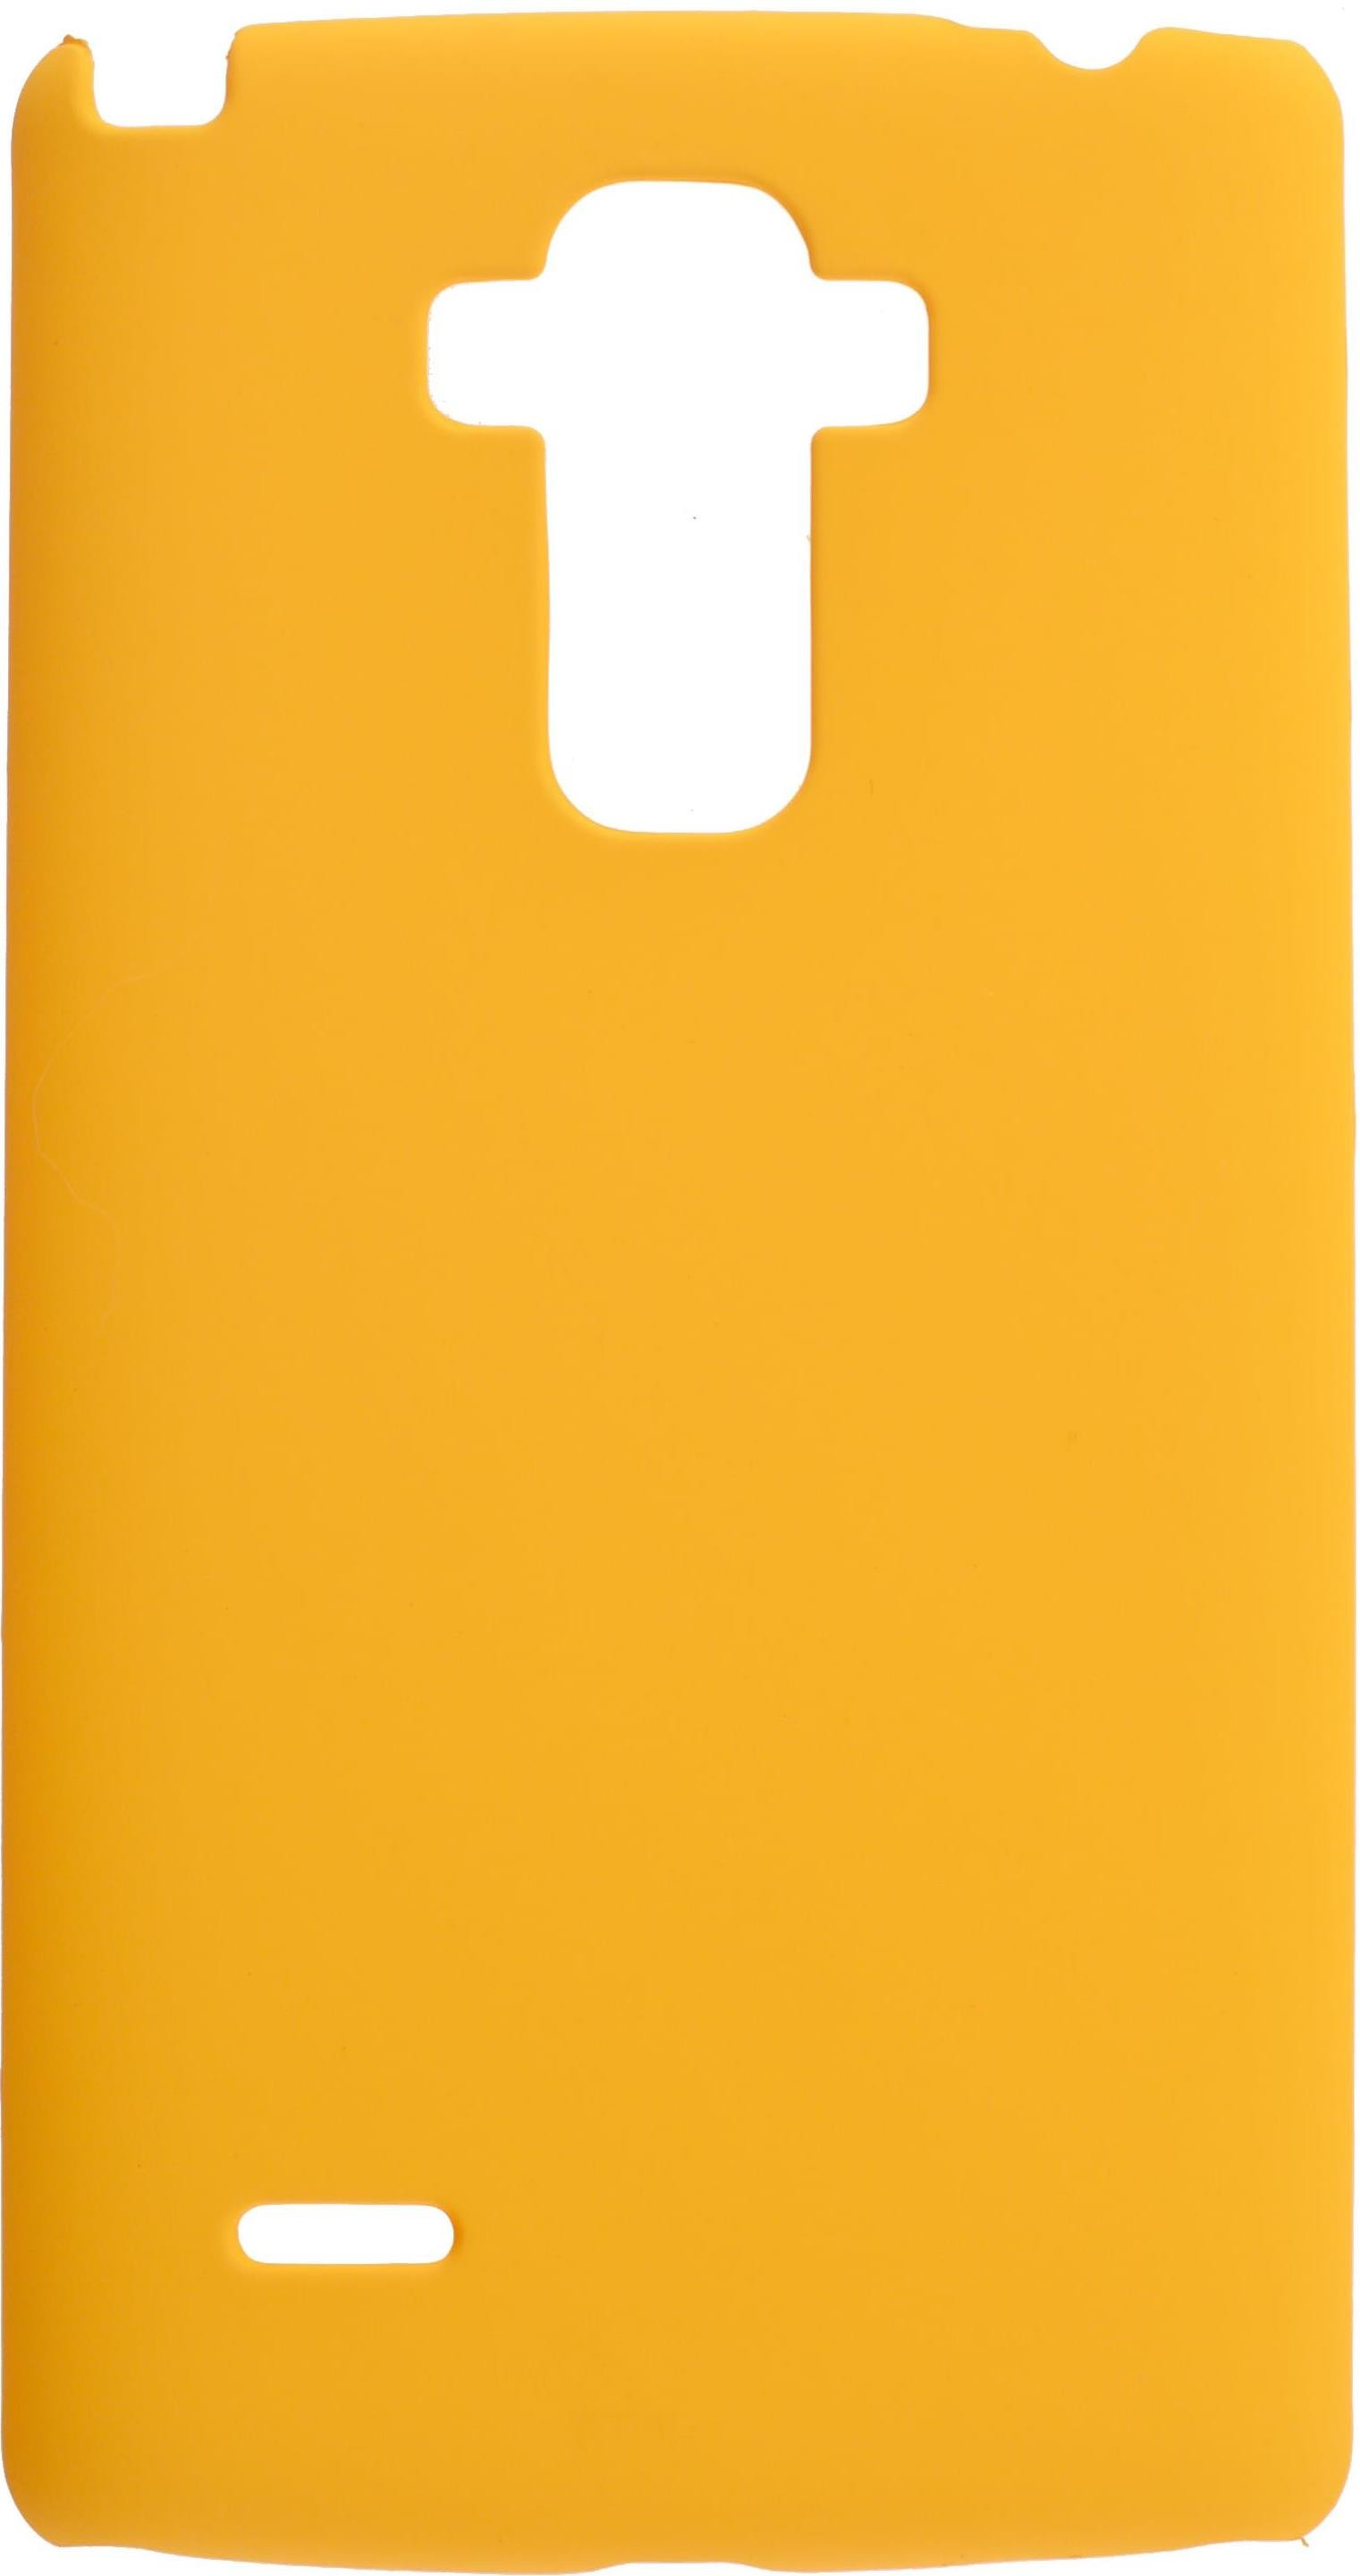 Чехол для сотового телефона skinBOX 4People, 4630042525061, желтый чехол для сотового телефона skinbox 4people 4630042526730 желтый